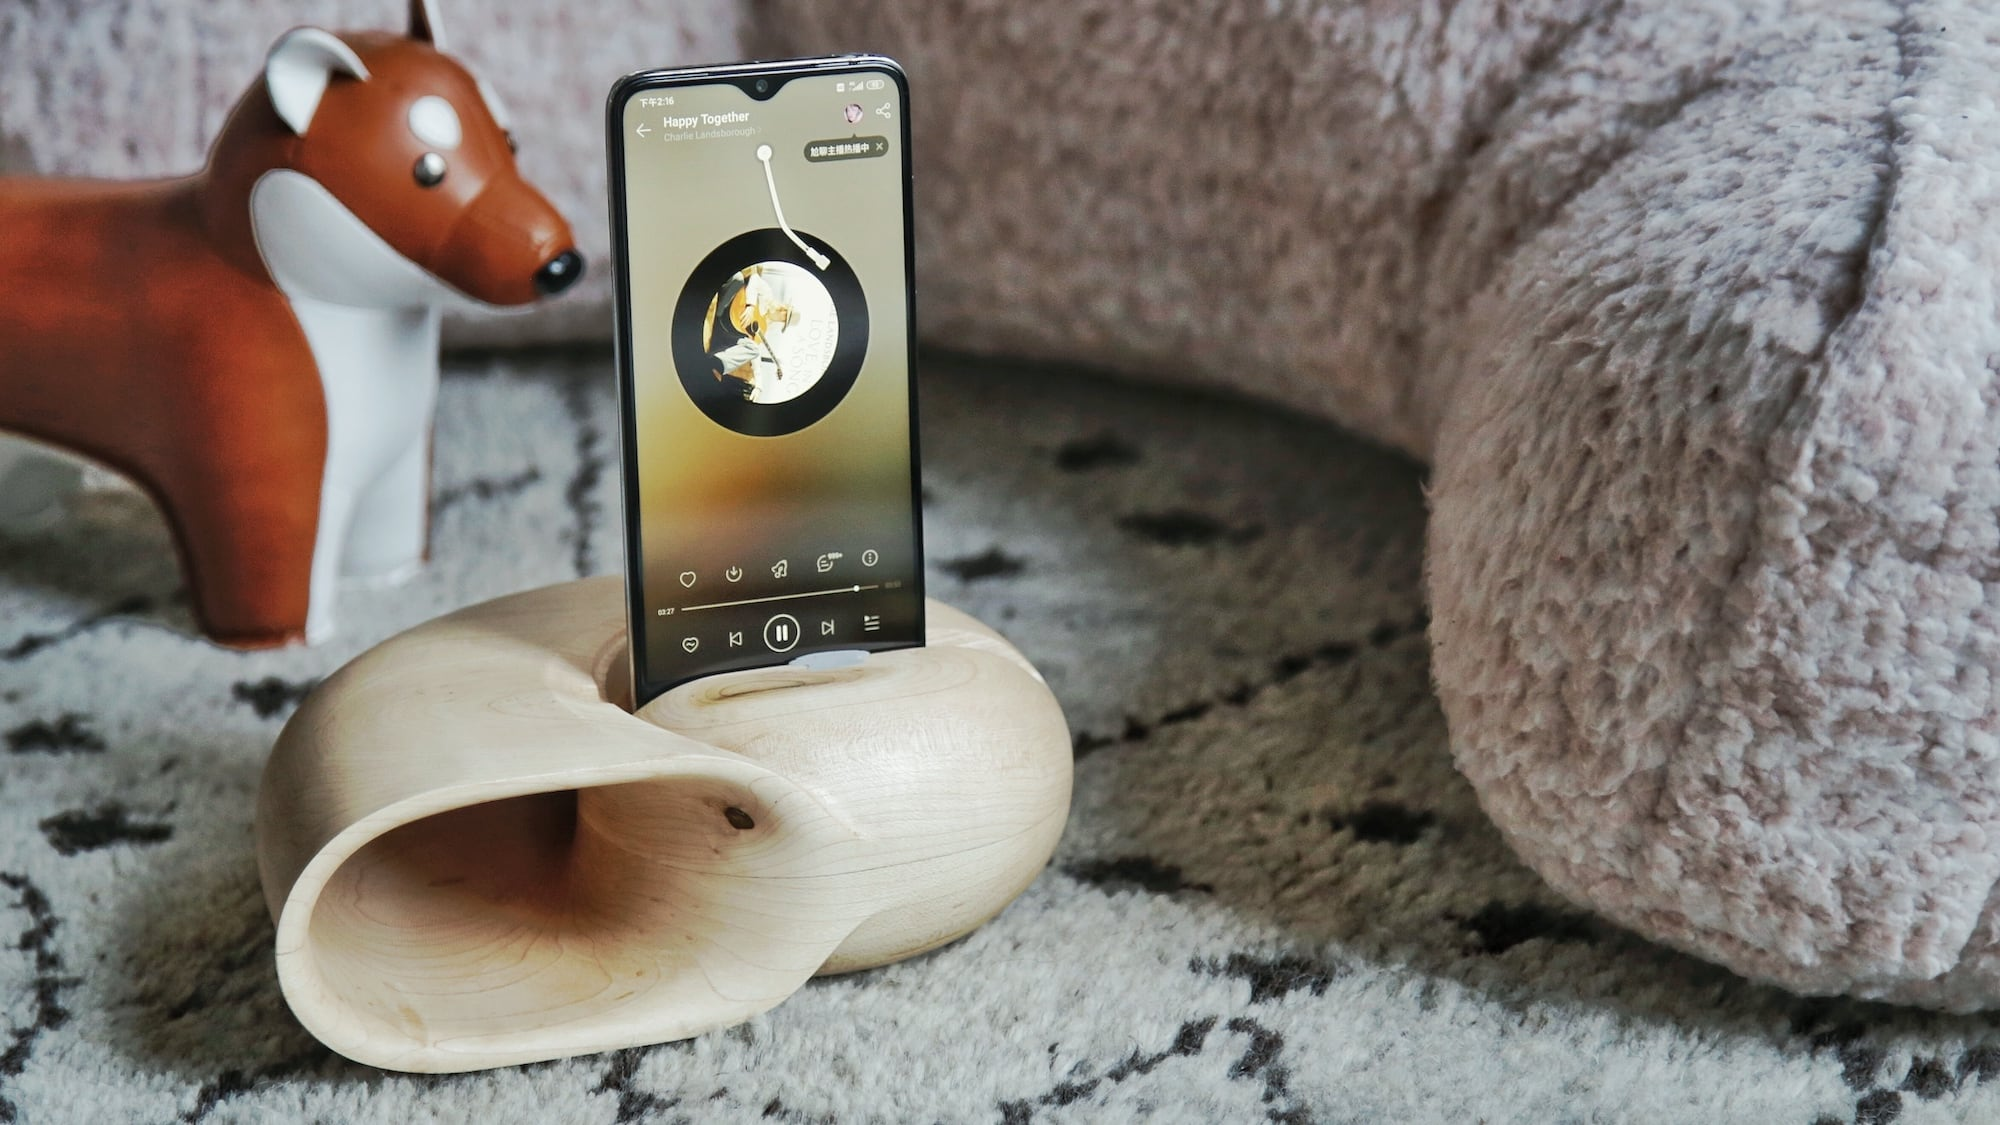 Nautilus Series & Minke Series unique smartphone speakers use physical amplification